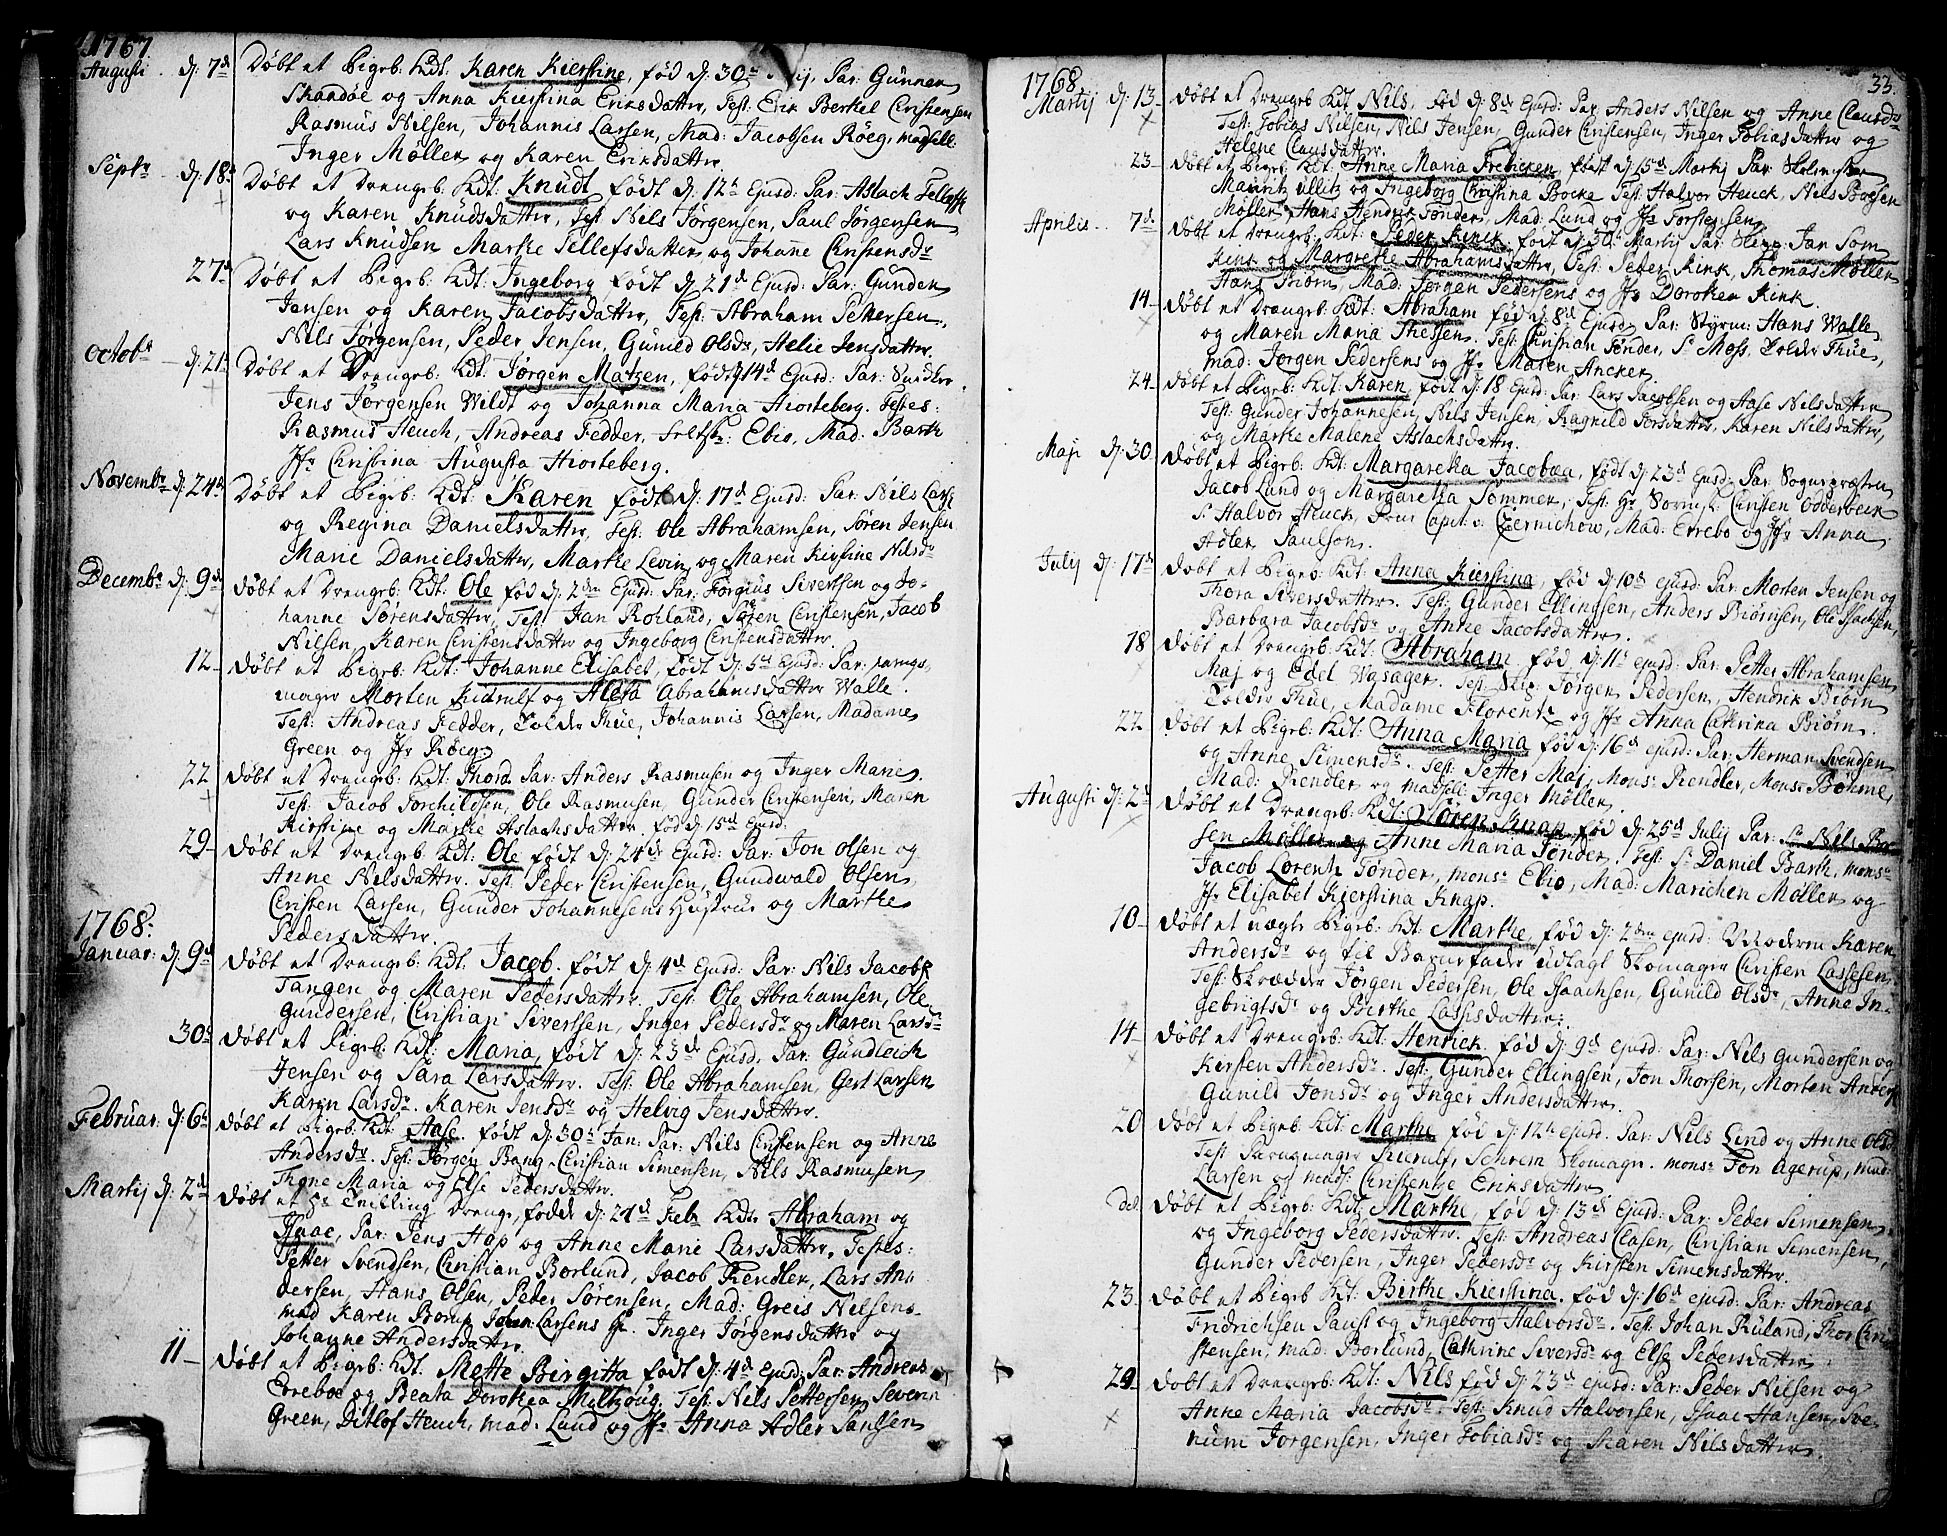 SAKO, Kragerø kirkebøker, F/Fa/L0002: Ministerialbok nr. 2, 1767-1802, s. 33